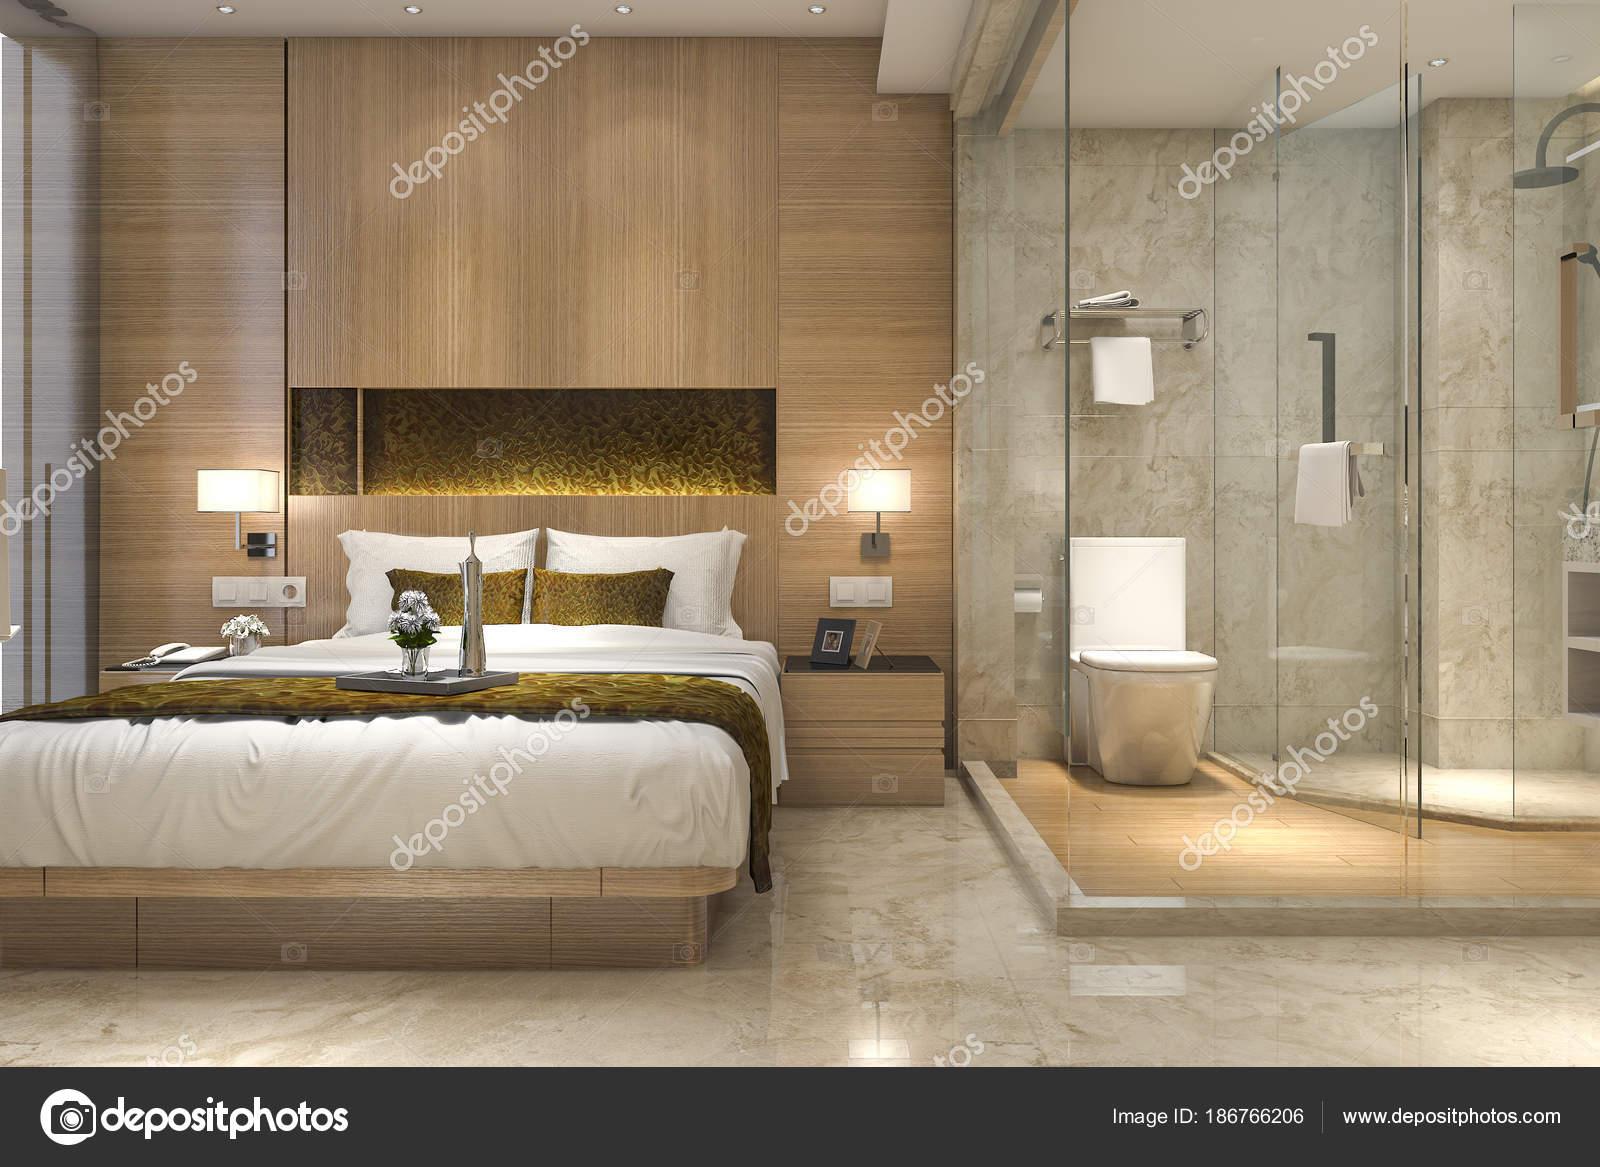 Salle Bain Suite Chambre Coucher Luxe Moderne Rendu — Photographie ...